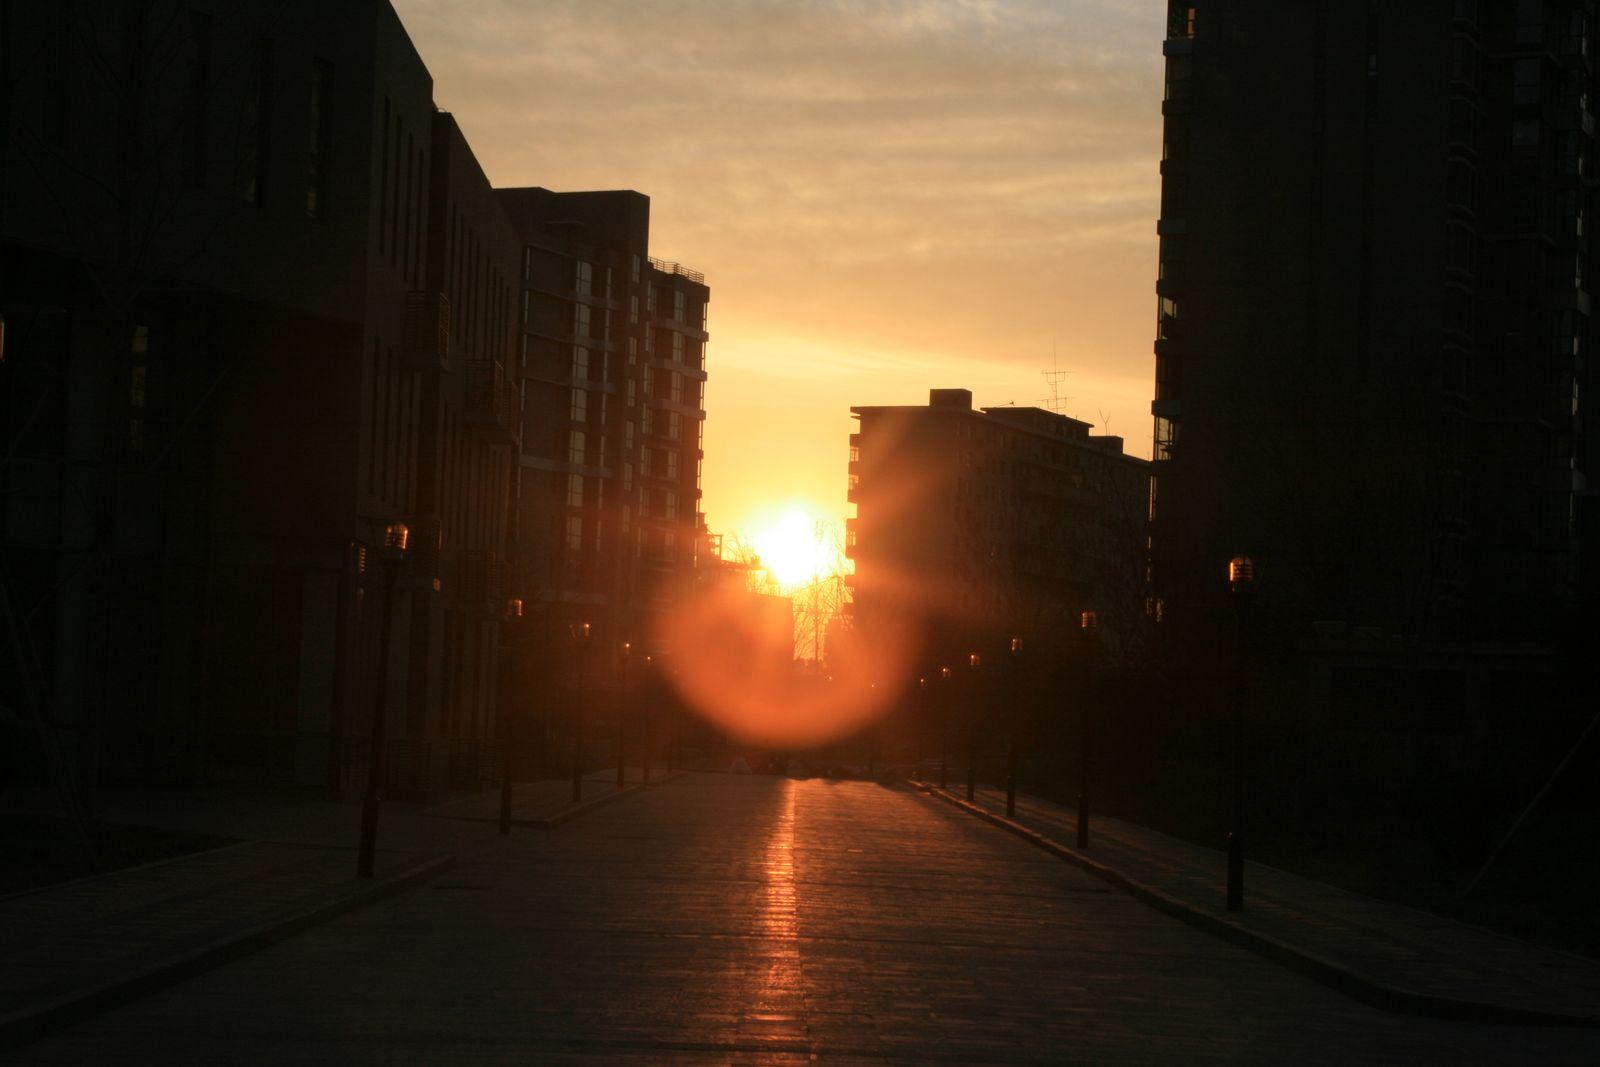 A sunrise in an oriental city.